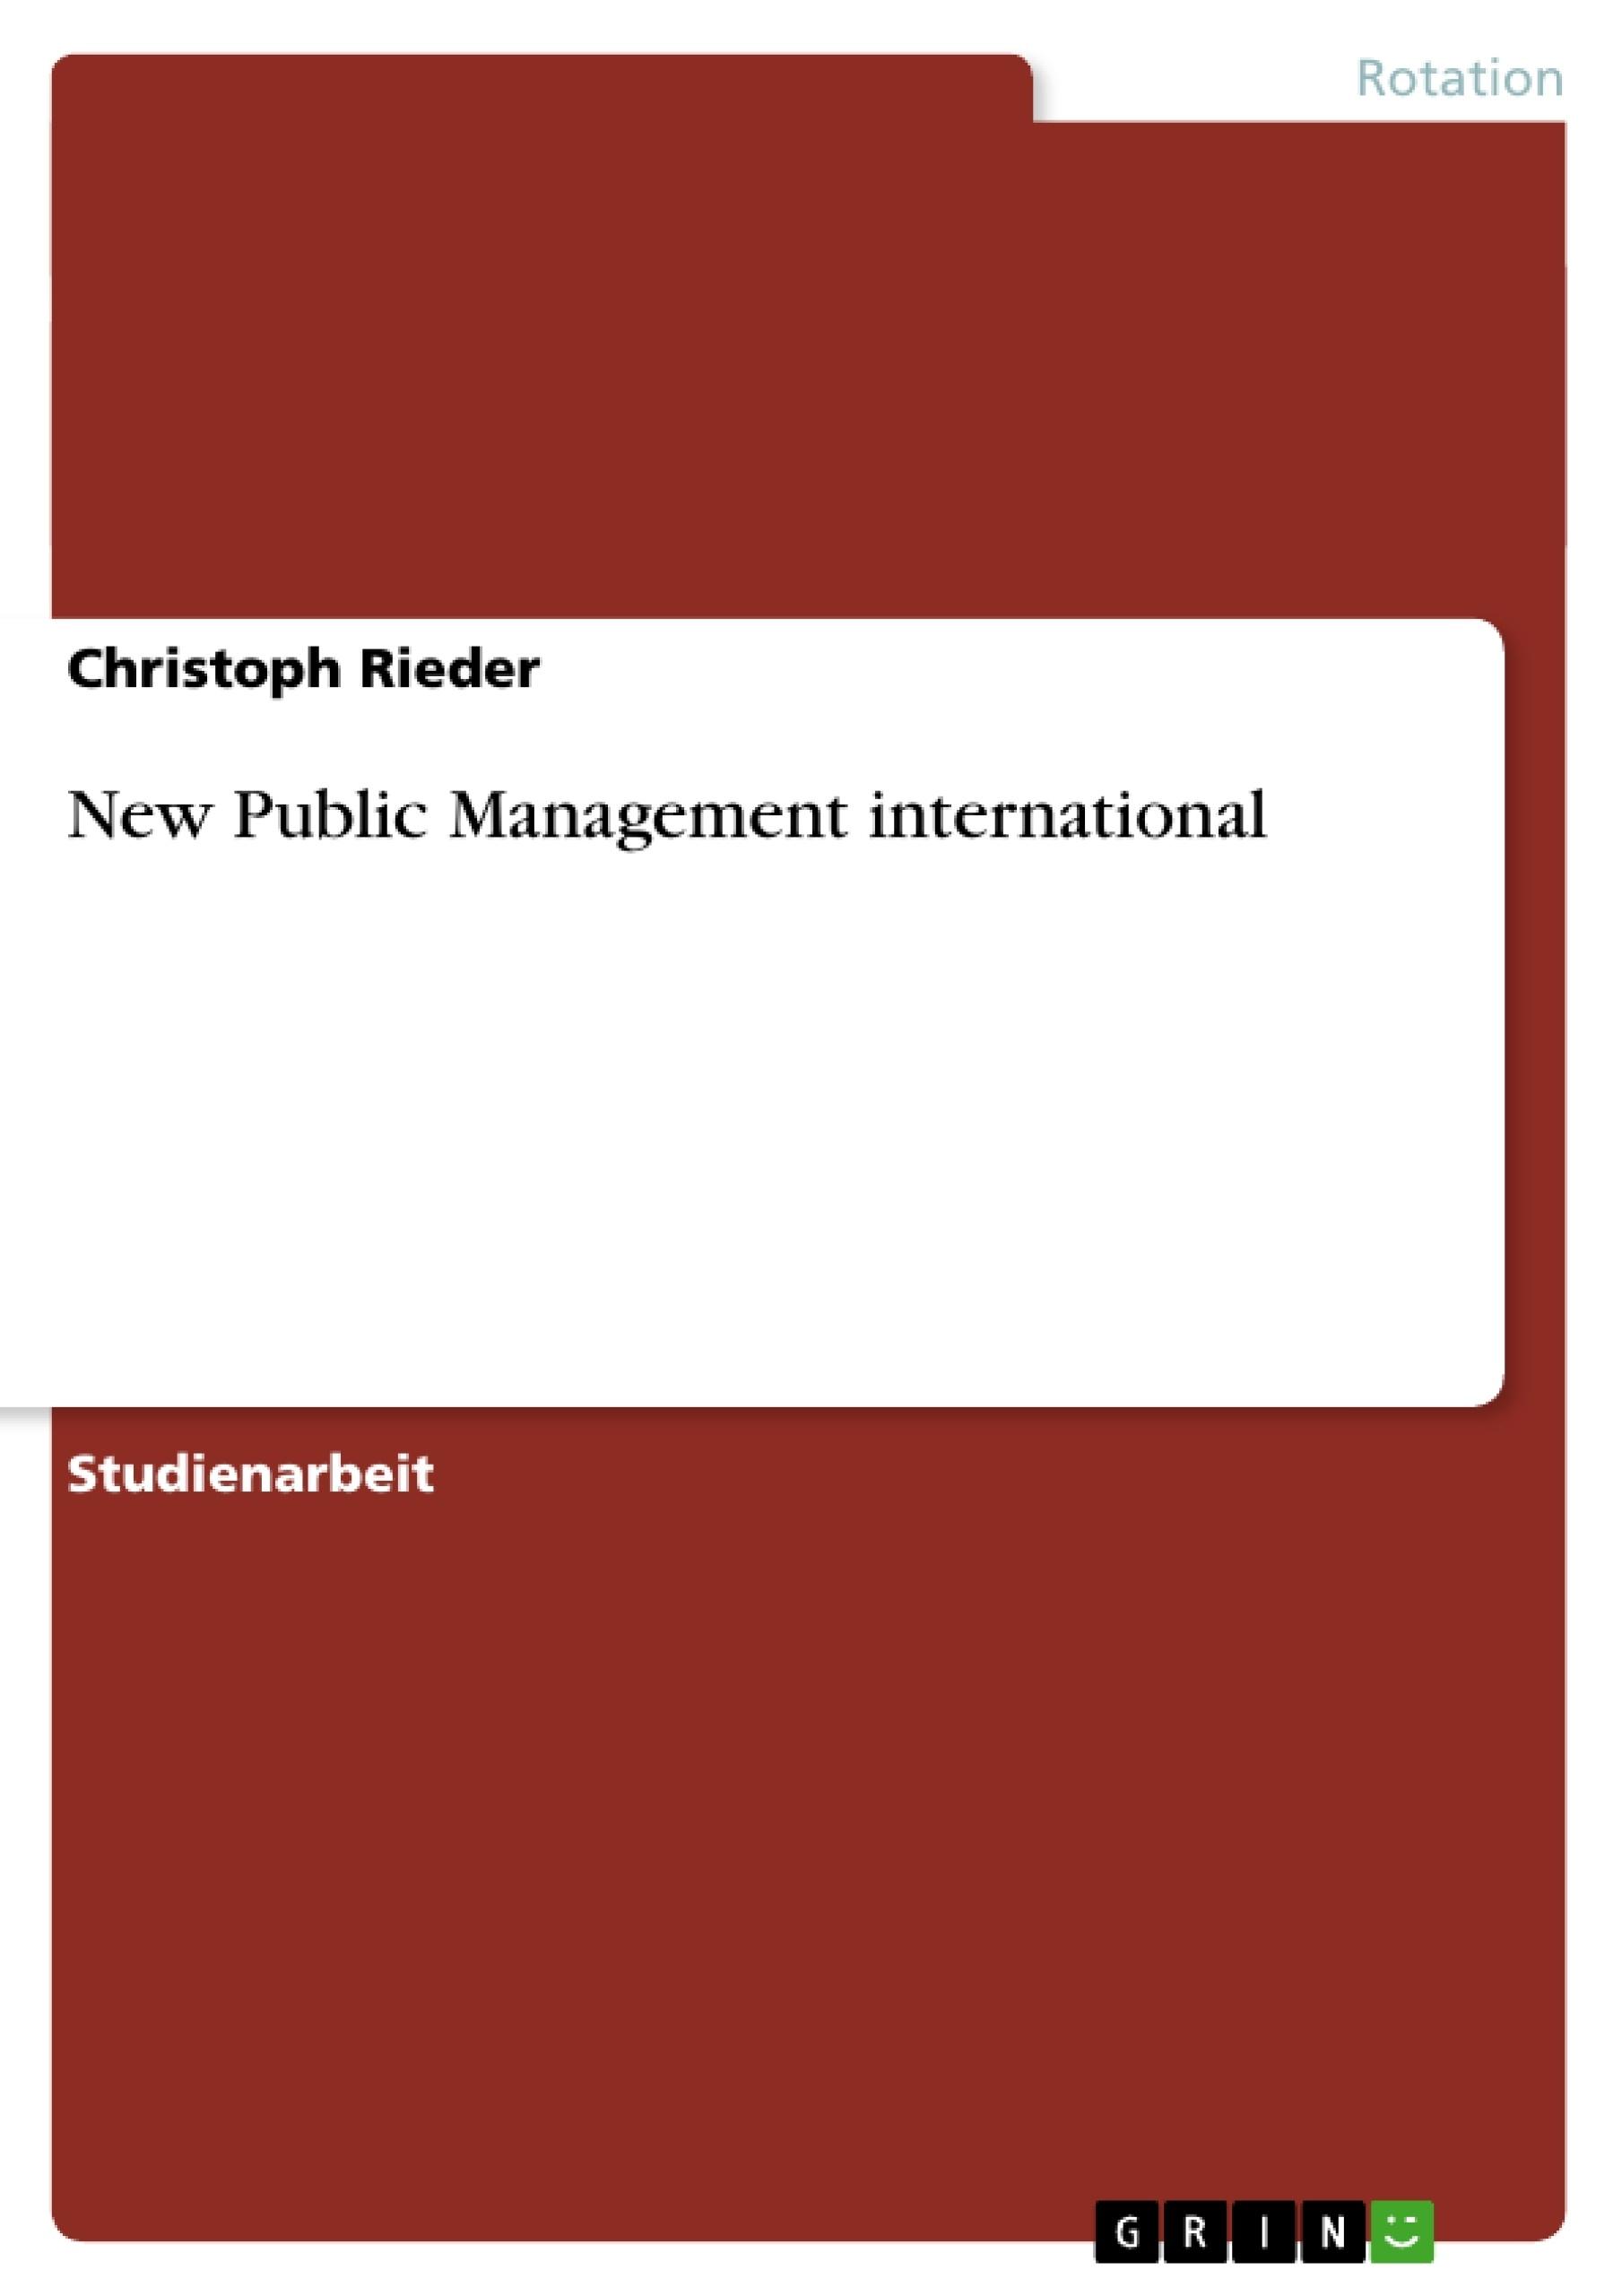 Titel: New Public Management international